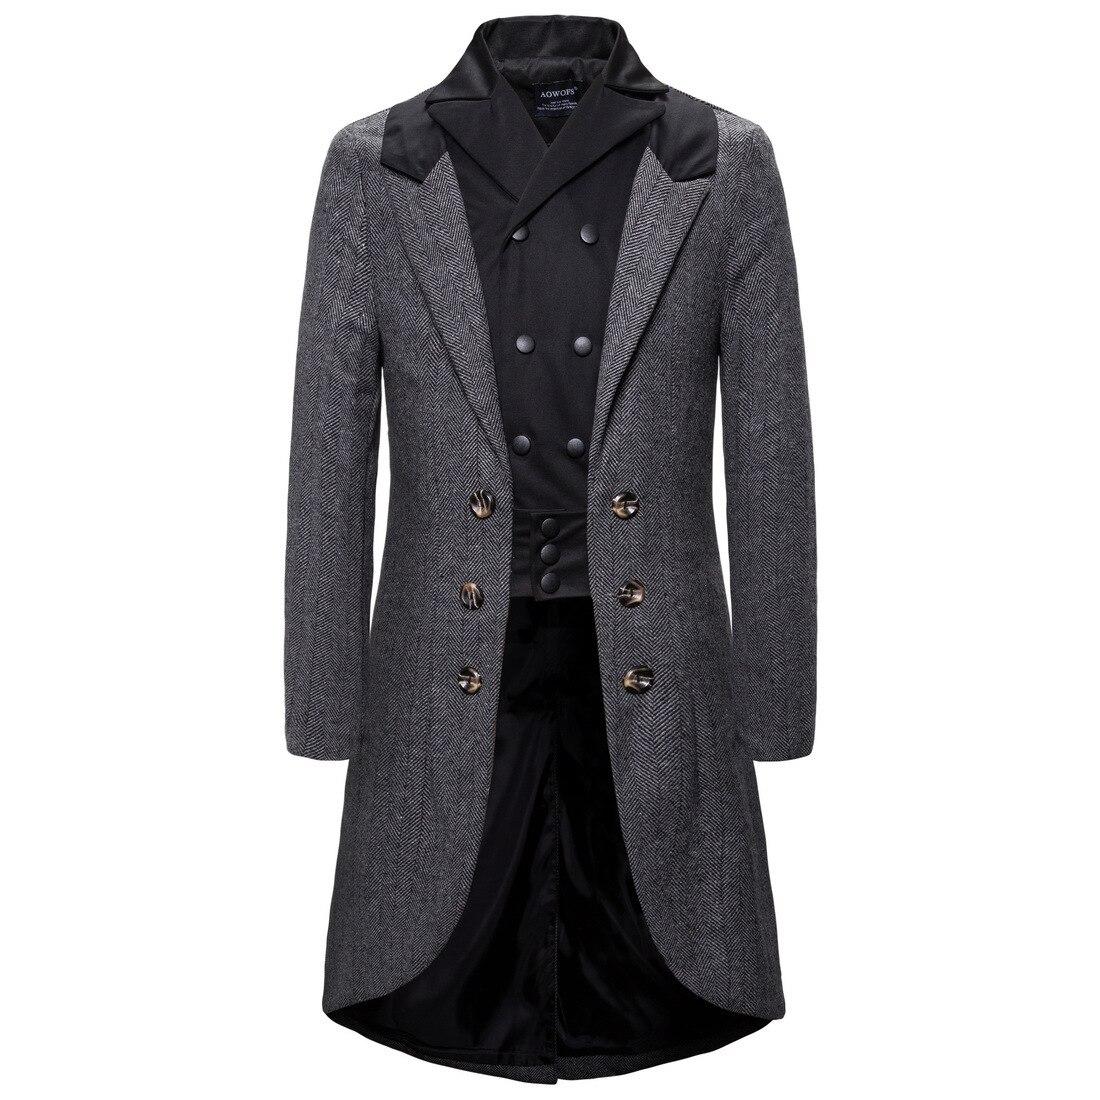 mens wool coats 2020 new hip hop slimming single-breasted men's tweed coat mid-length trench coat